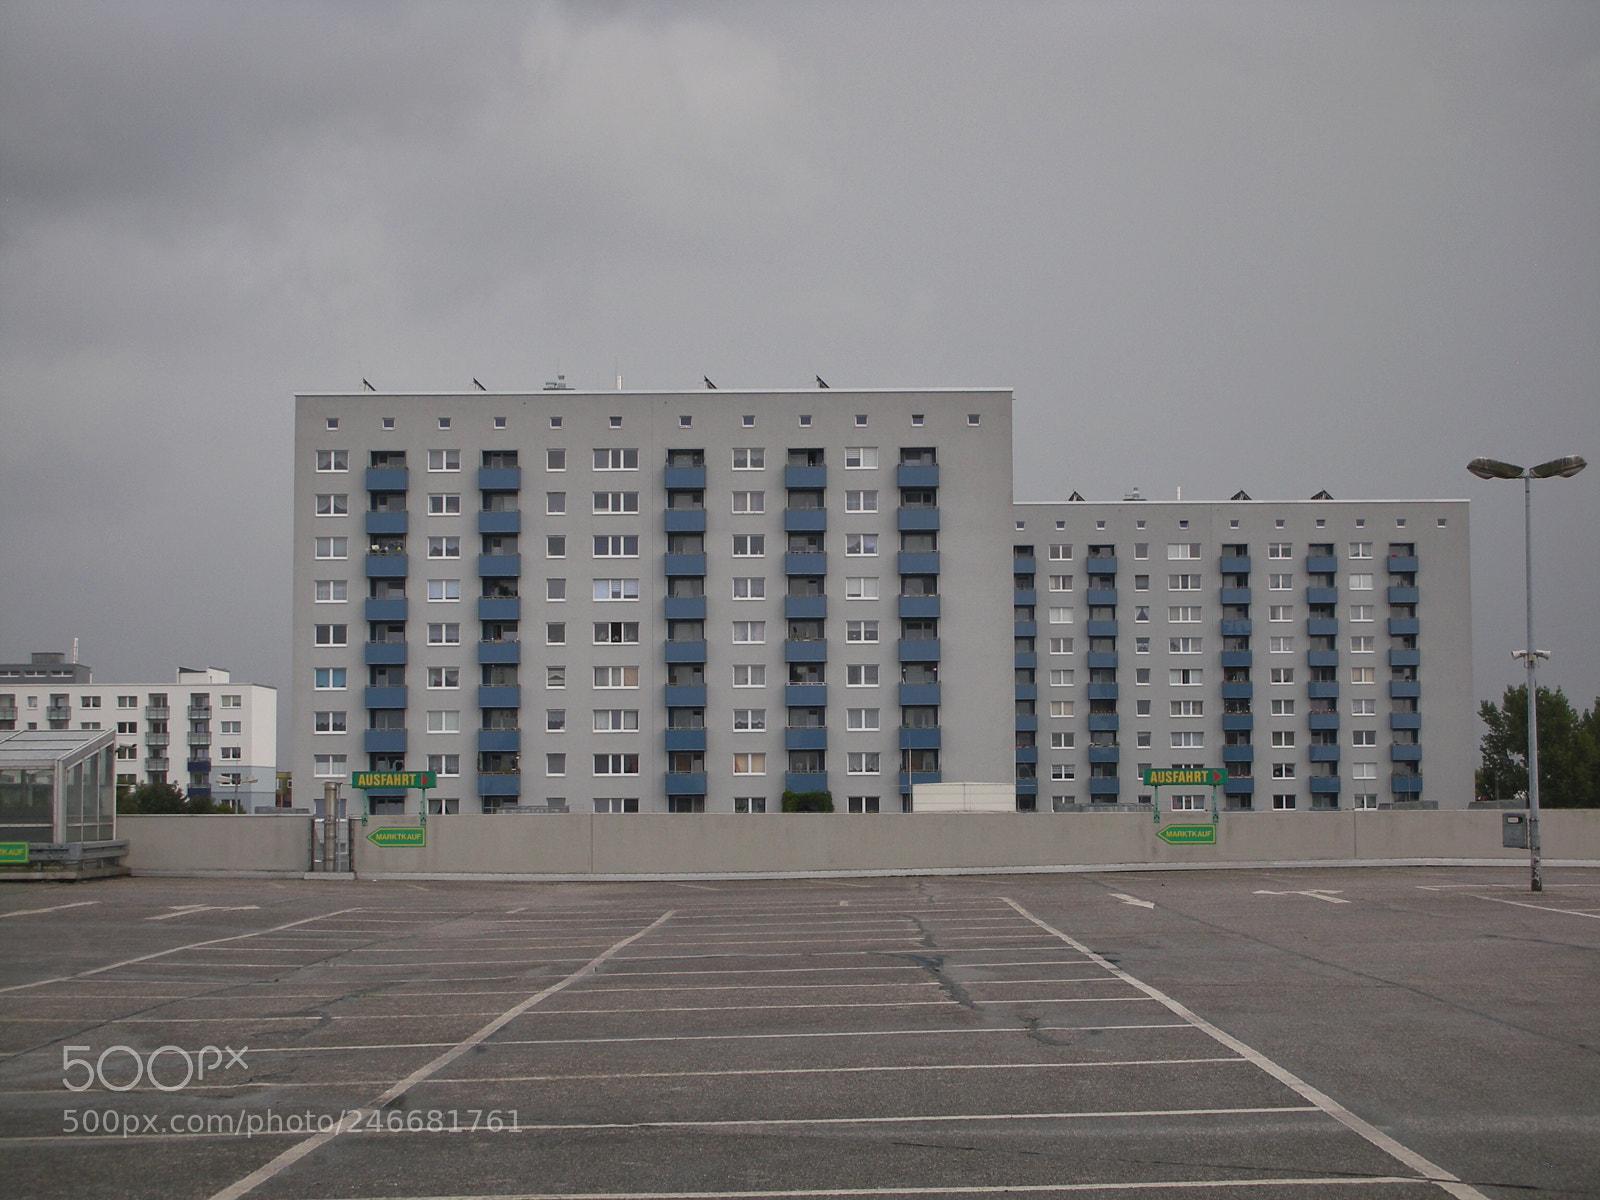 "Nikon COOLPIX S8 sample photo. ""Blocks, wilhelmsburg - hamburg 2017"" photography"